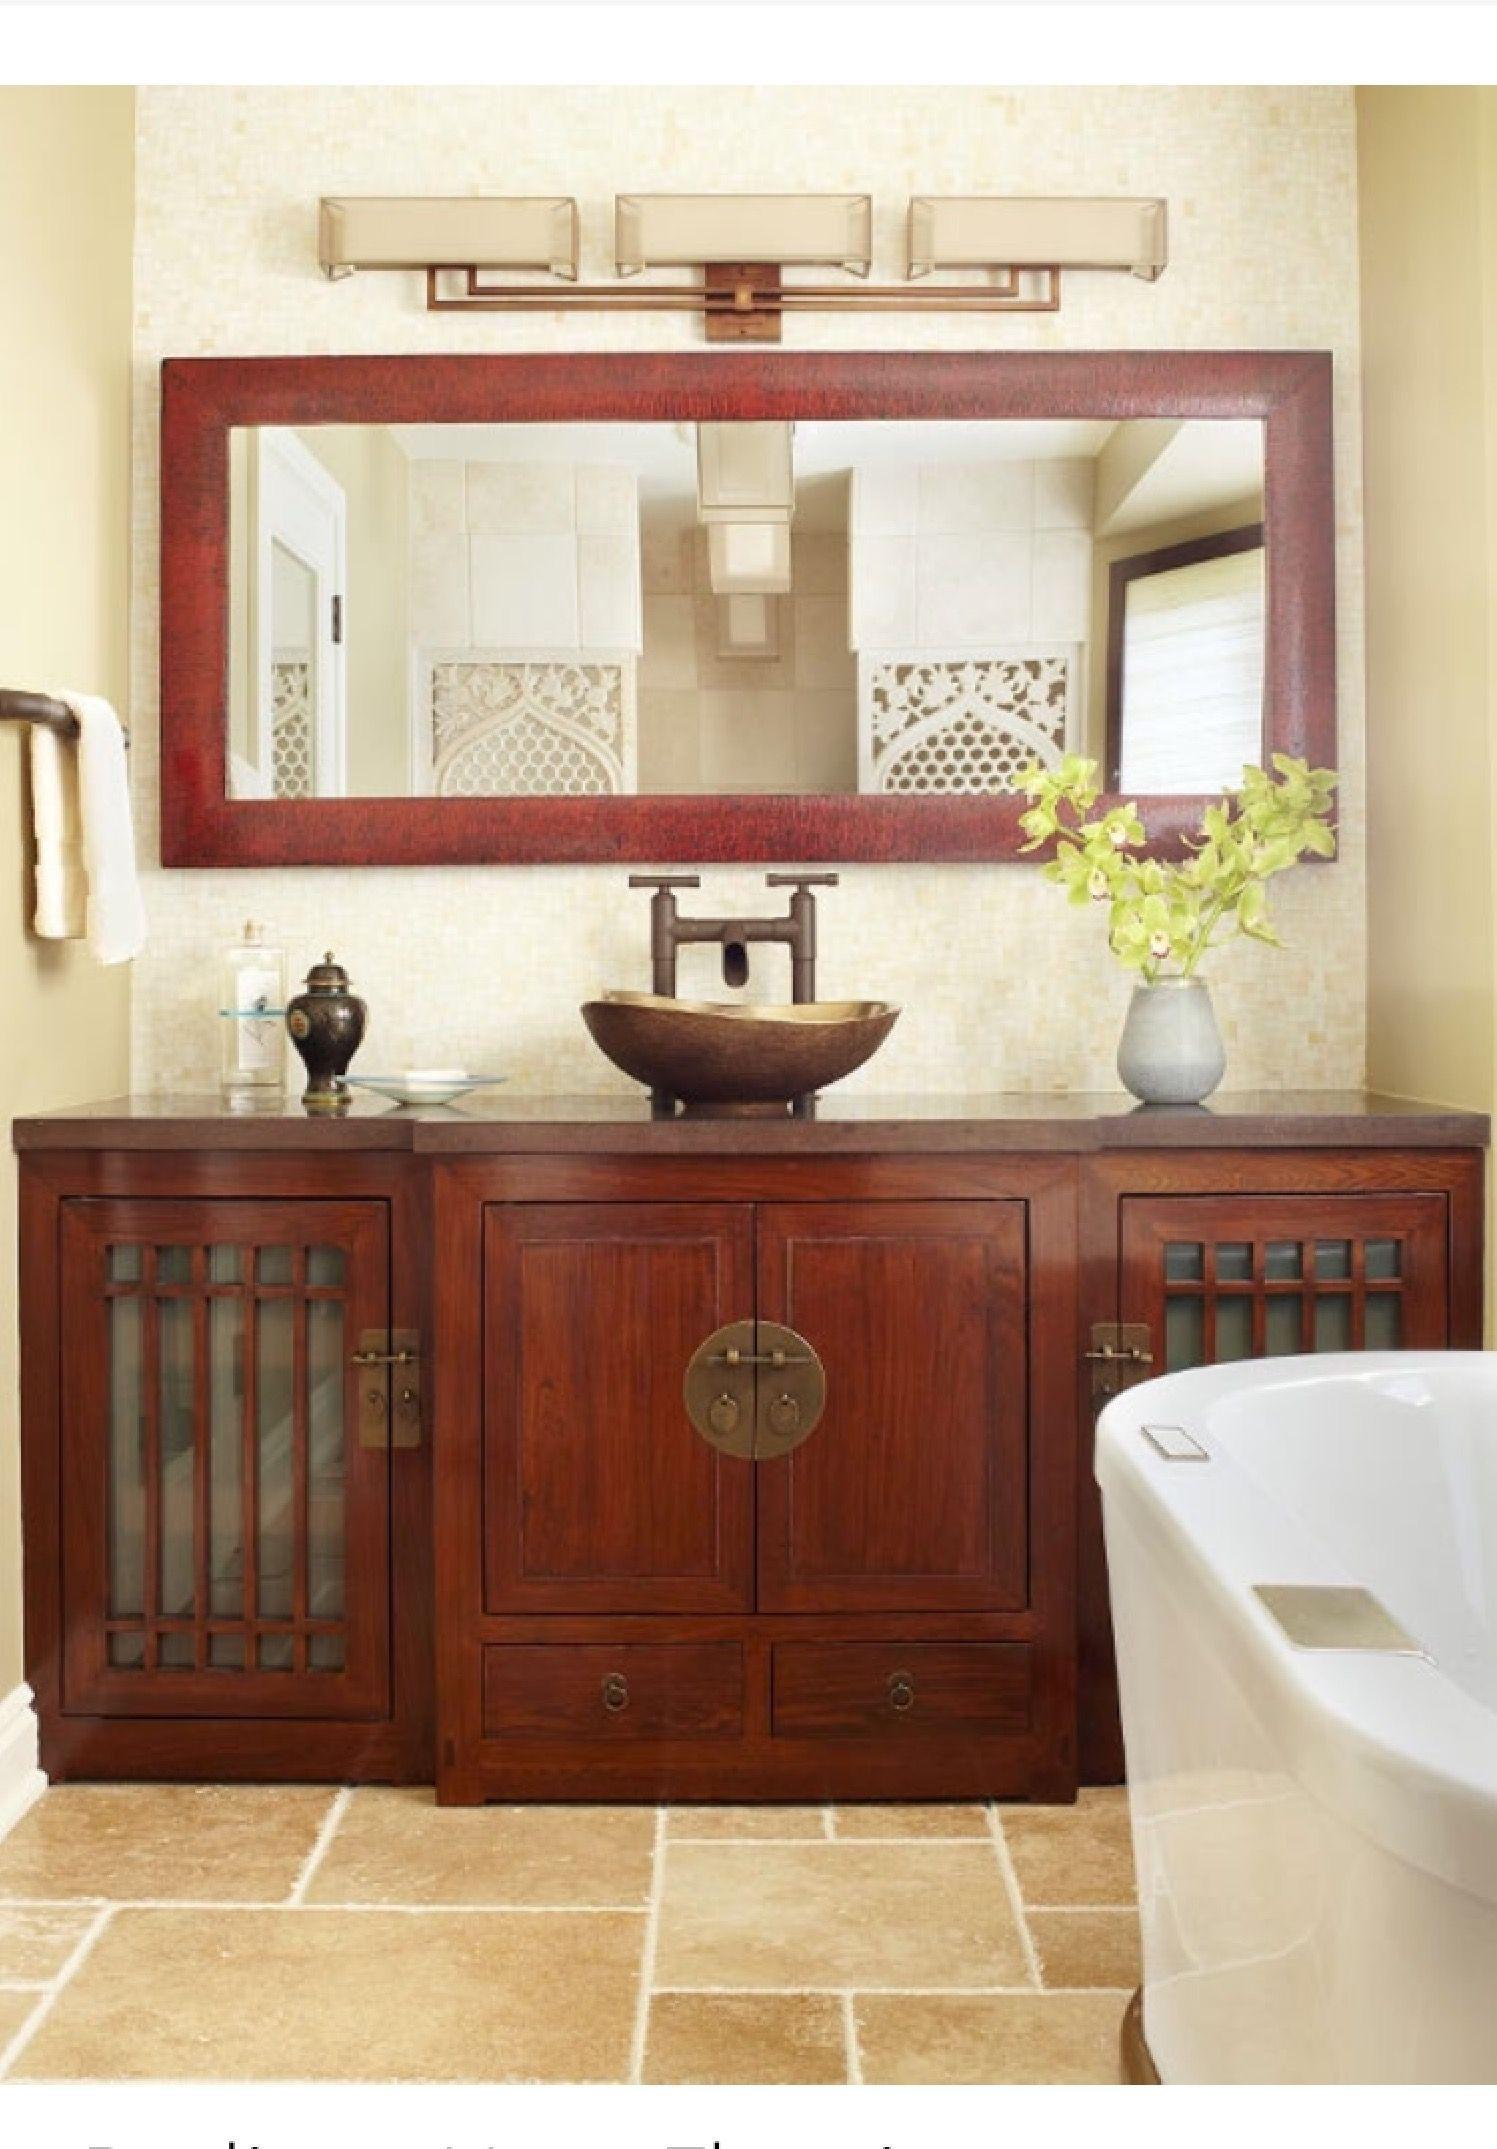 Beautiful Asian Inspired Bathroom Love It! #Decoratingbathrooms